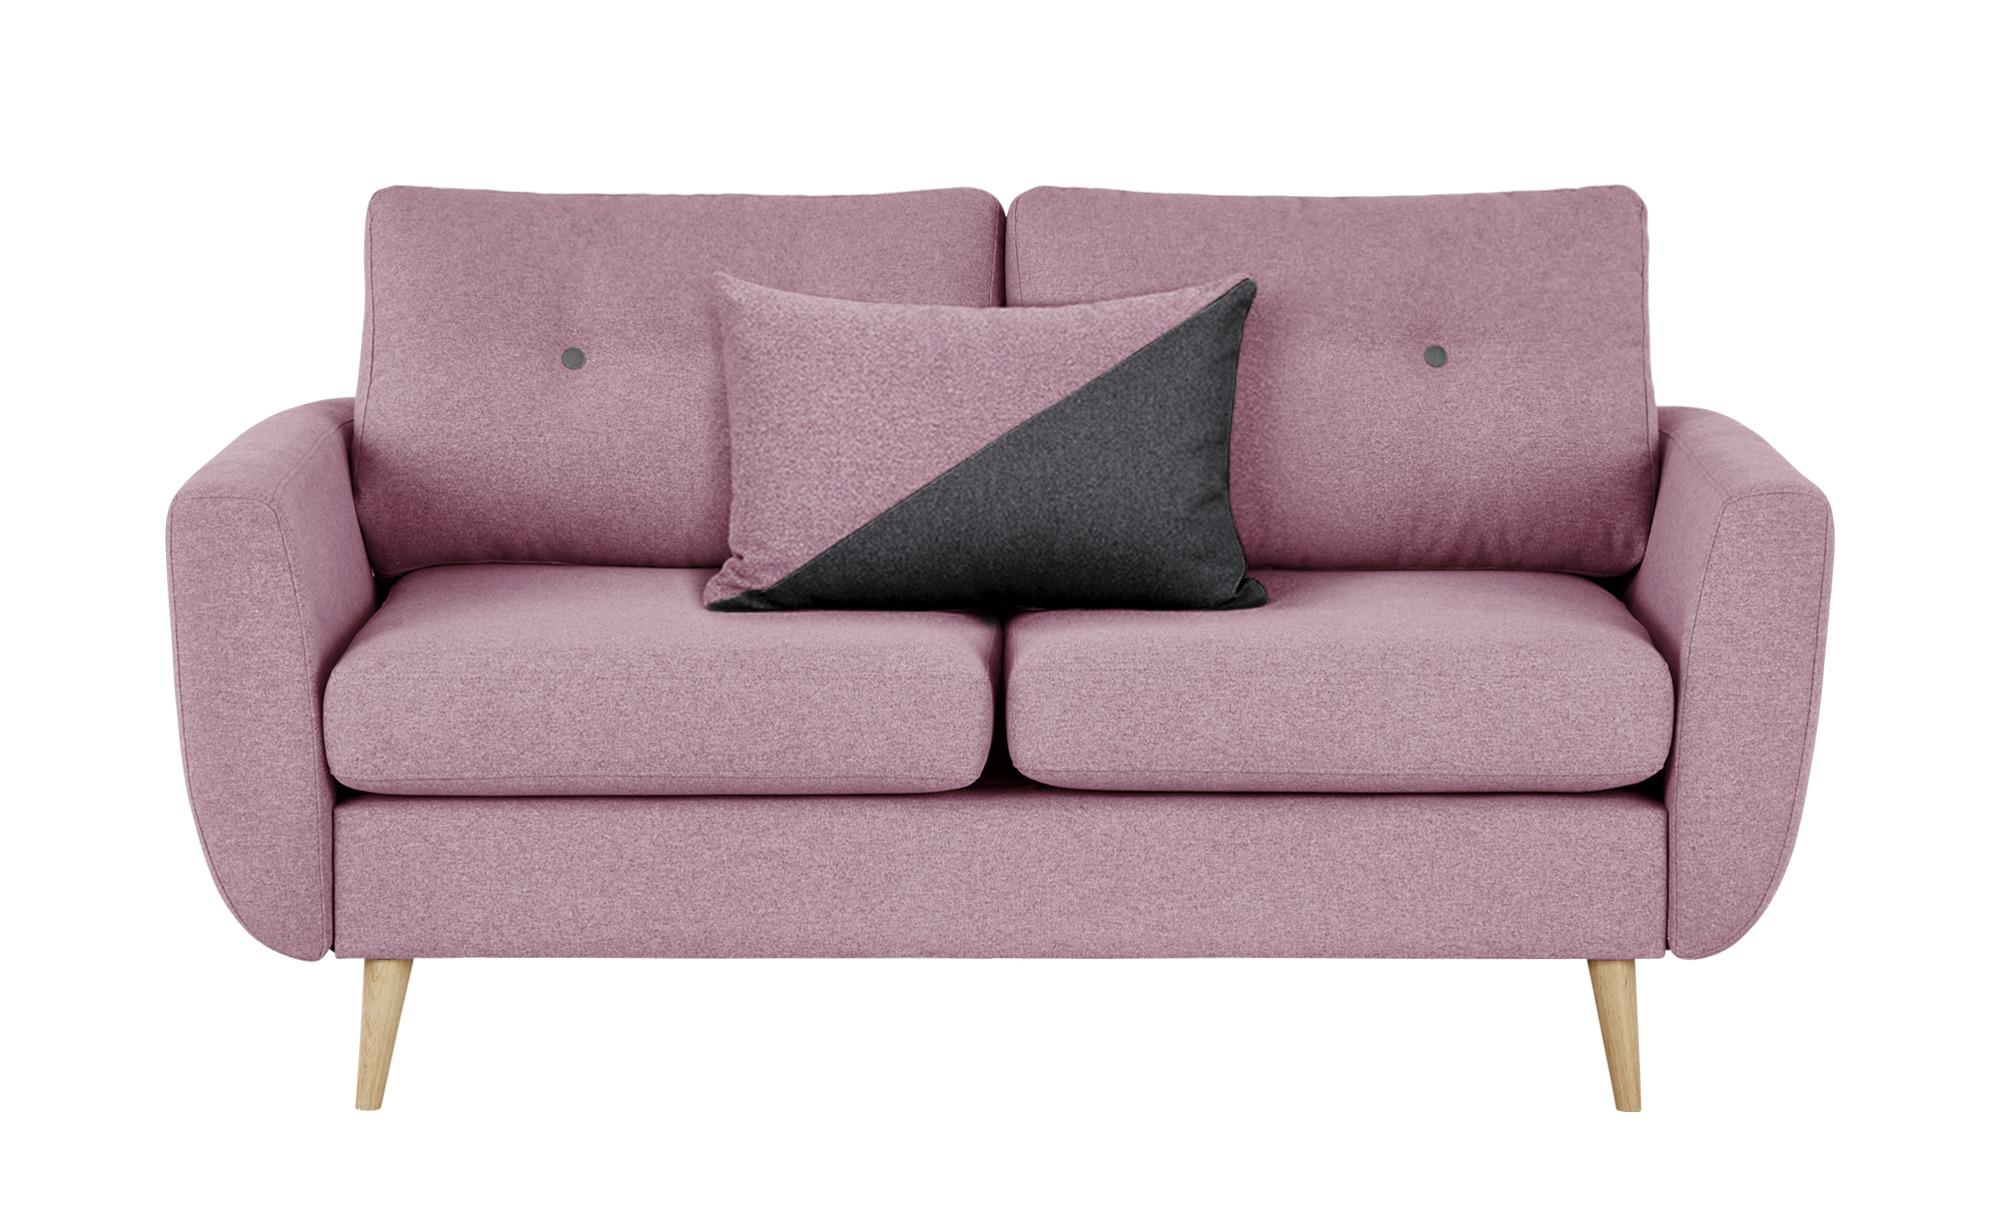 finya Sofa  Harris ¦ rosa/pink ¦ Maße (cm): B: 161 H: 85 T: 92 Polstermöbel > Sofas > 2-Sitzer - Höffner